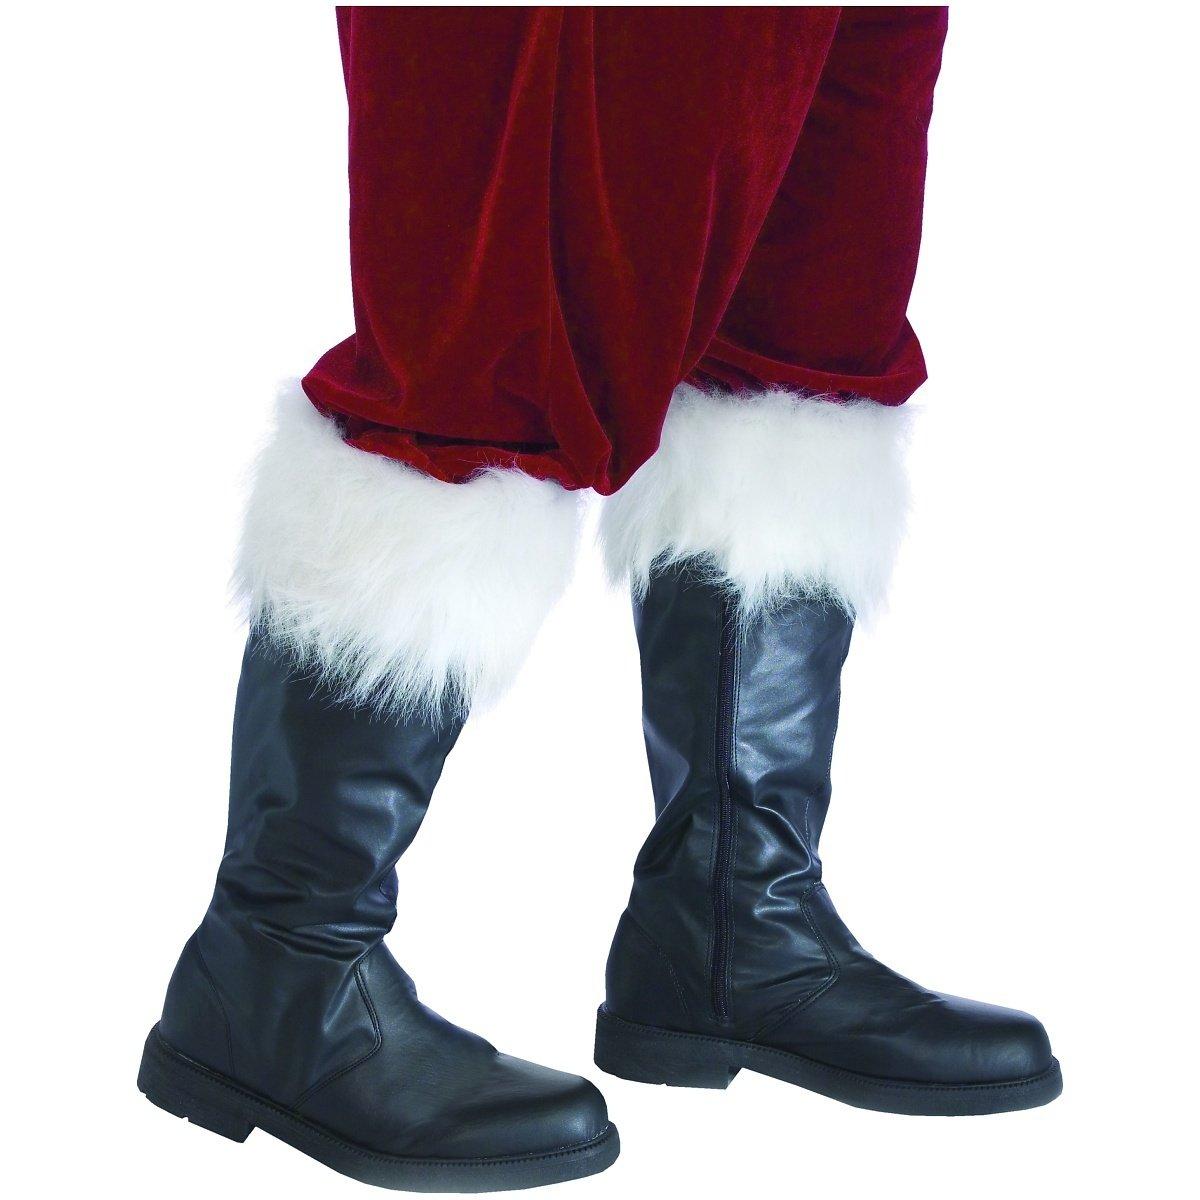 Professional Santa Boots Adult Halco